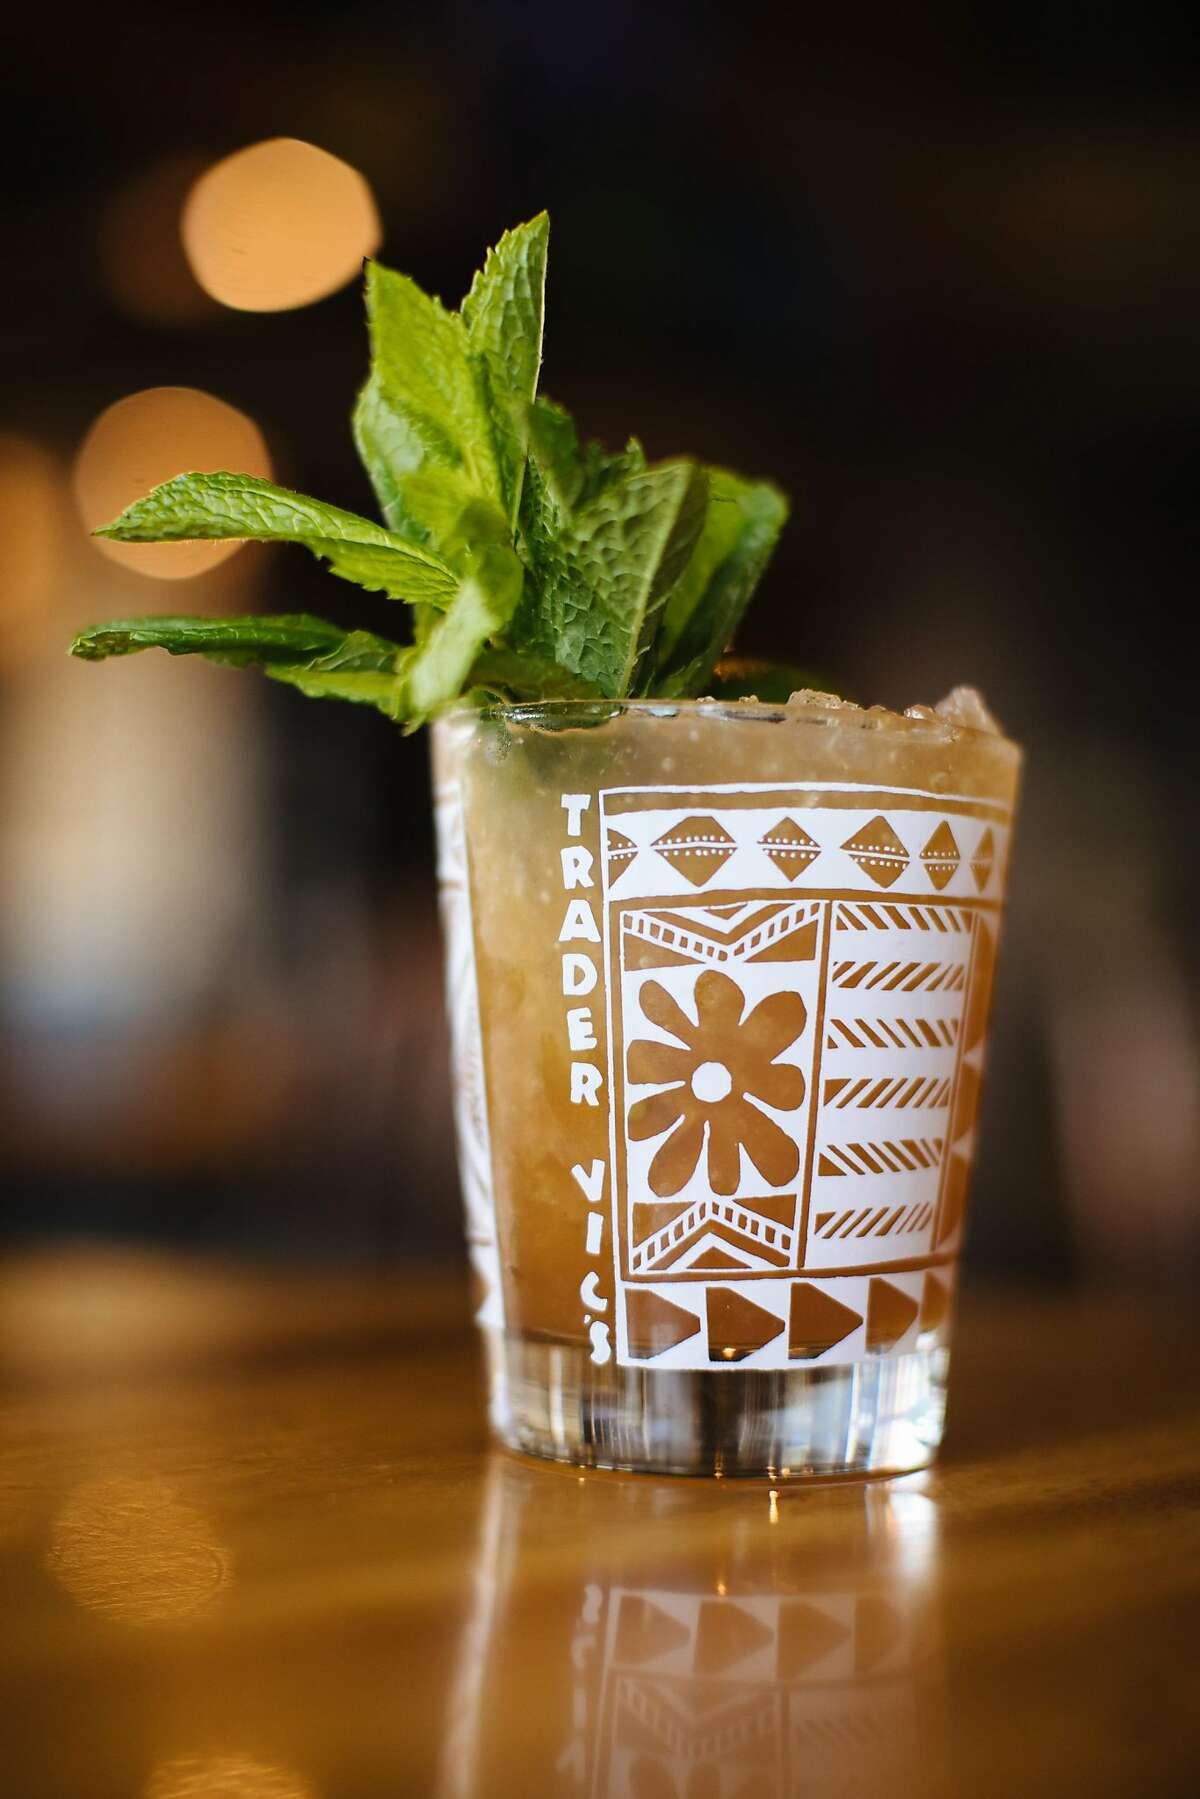 A mai tai at the bar that invented it: Trader Vic's.